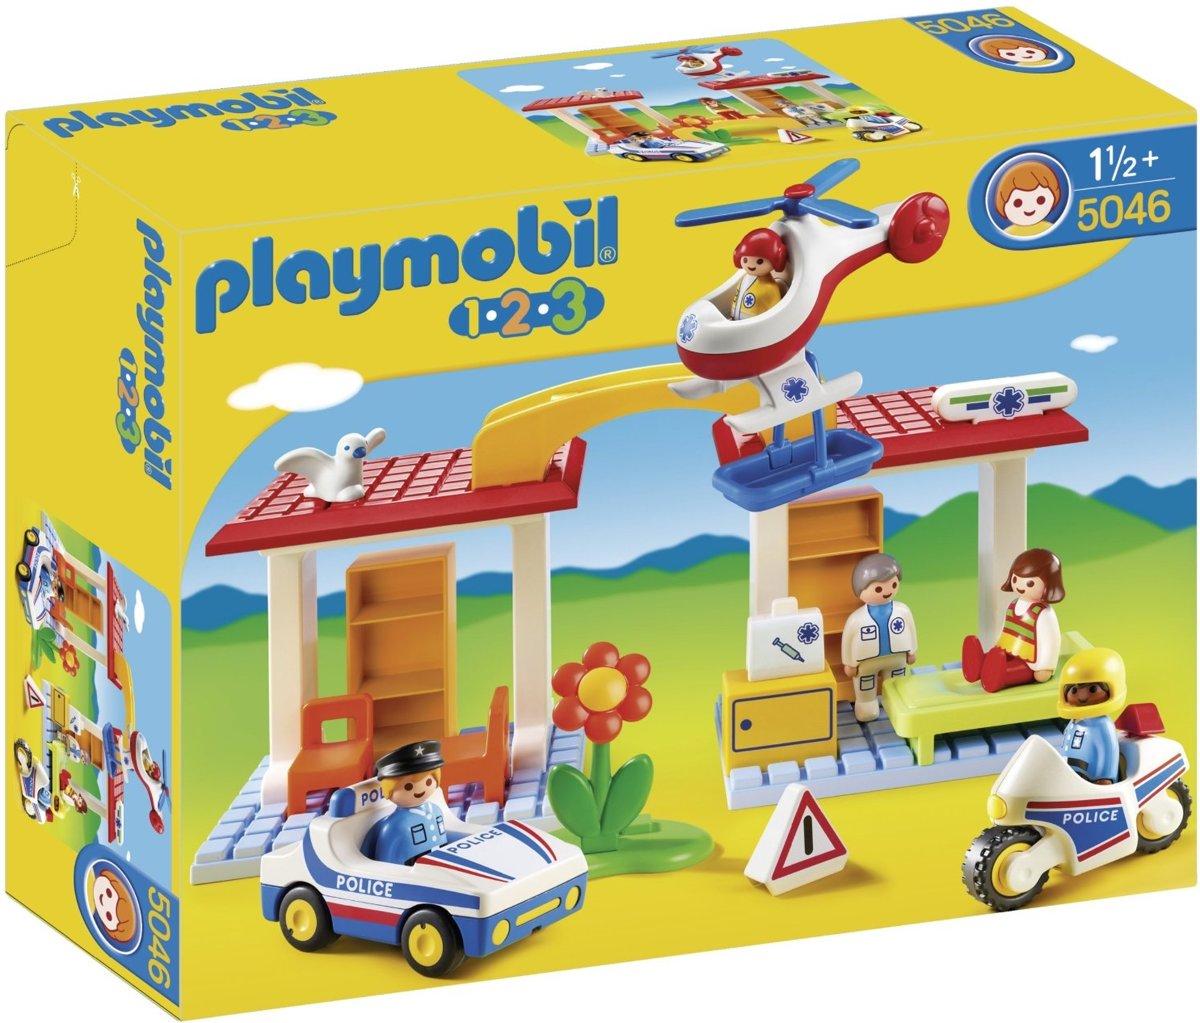 1-2-3-PLAYMOBIL 5046 POLICE & AMBULANCE